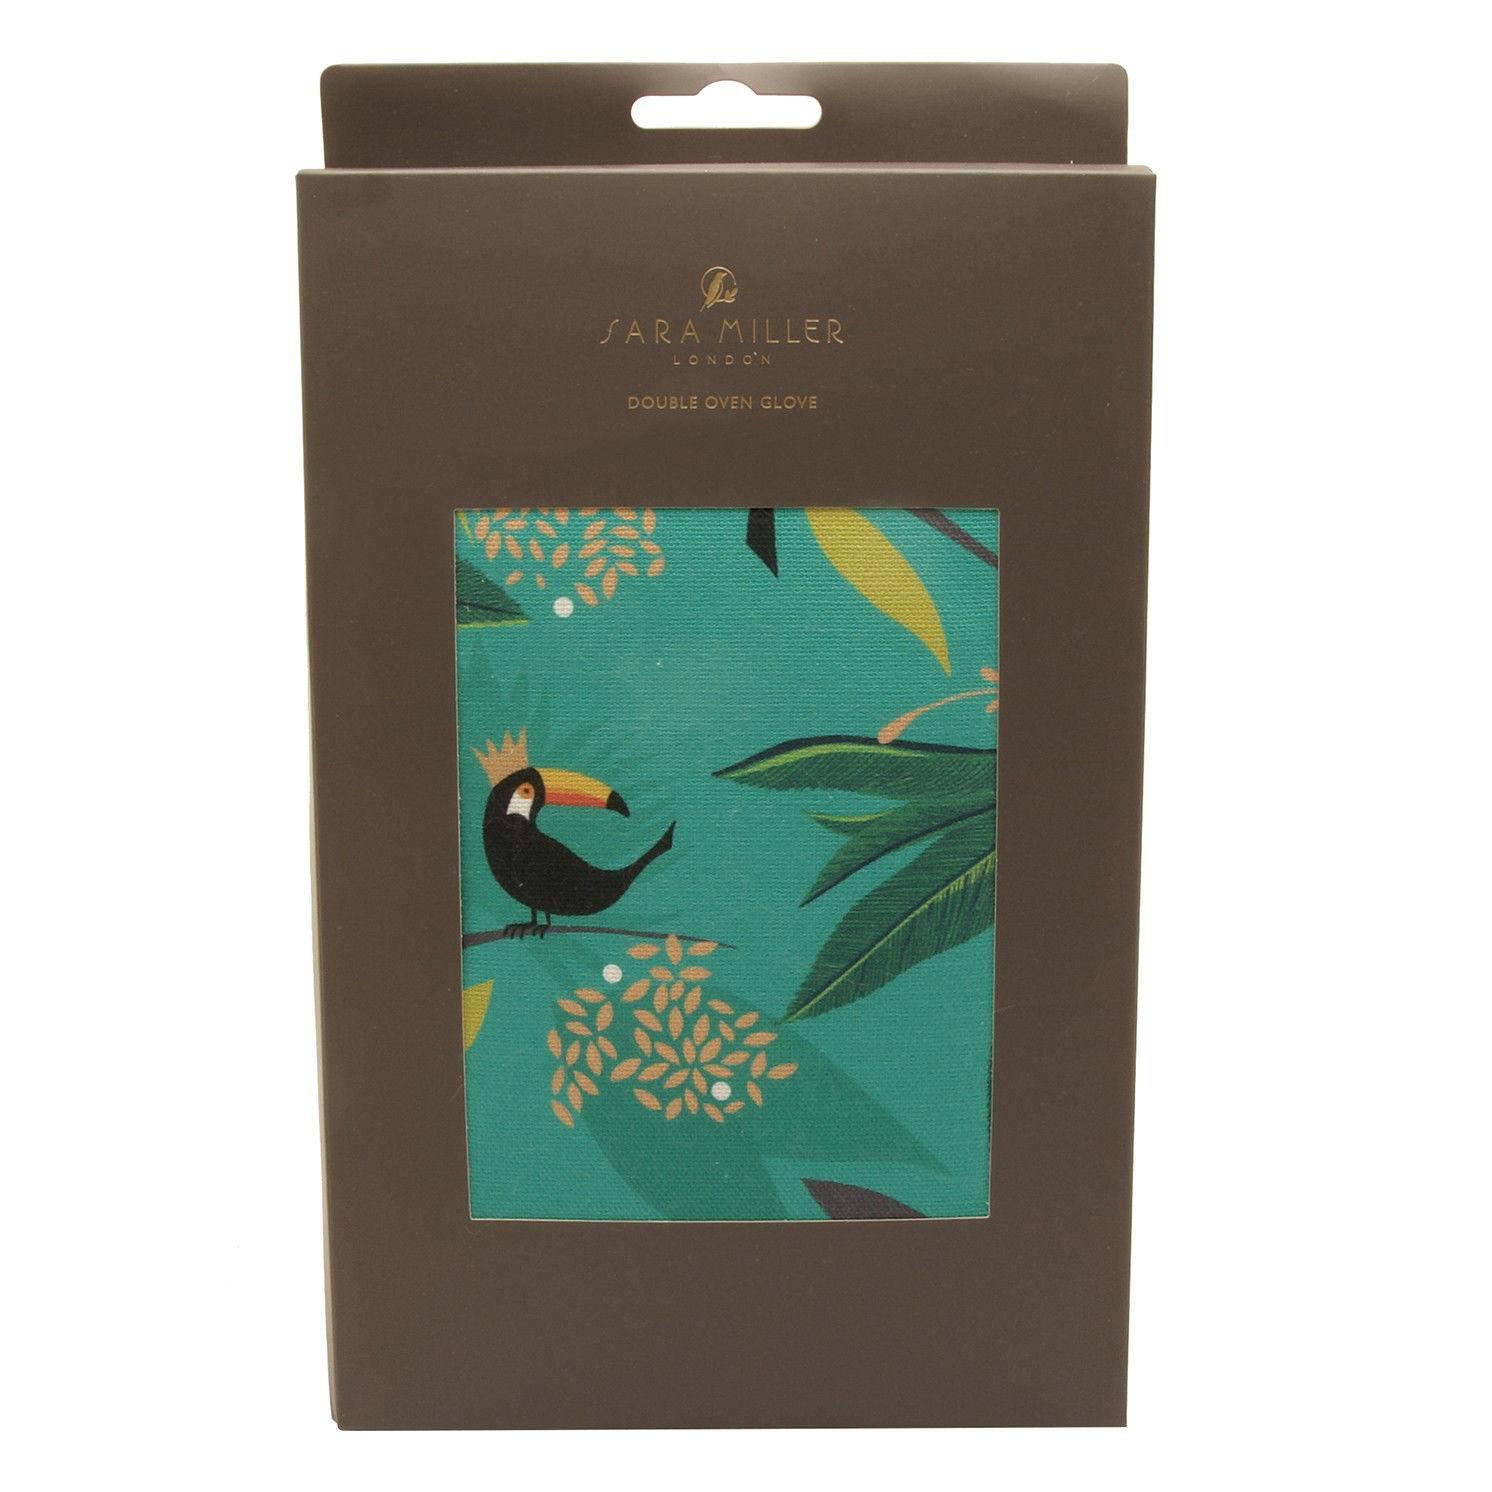 Sara Miller – Toucan Double Oven Glove in Presentation Gift Box